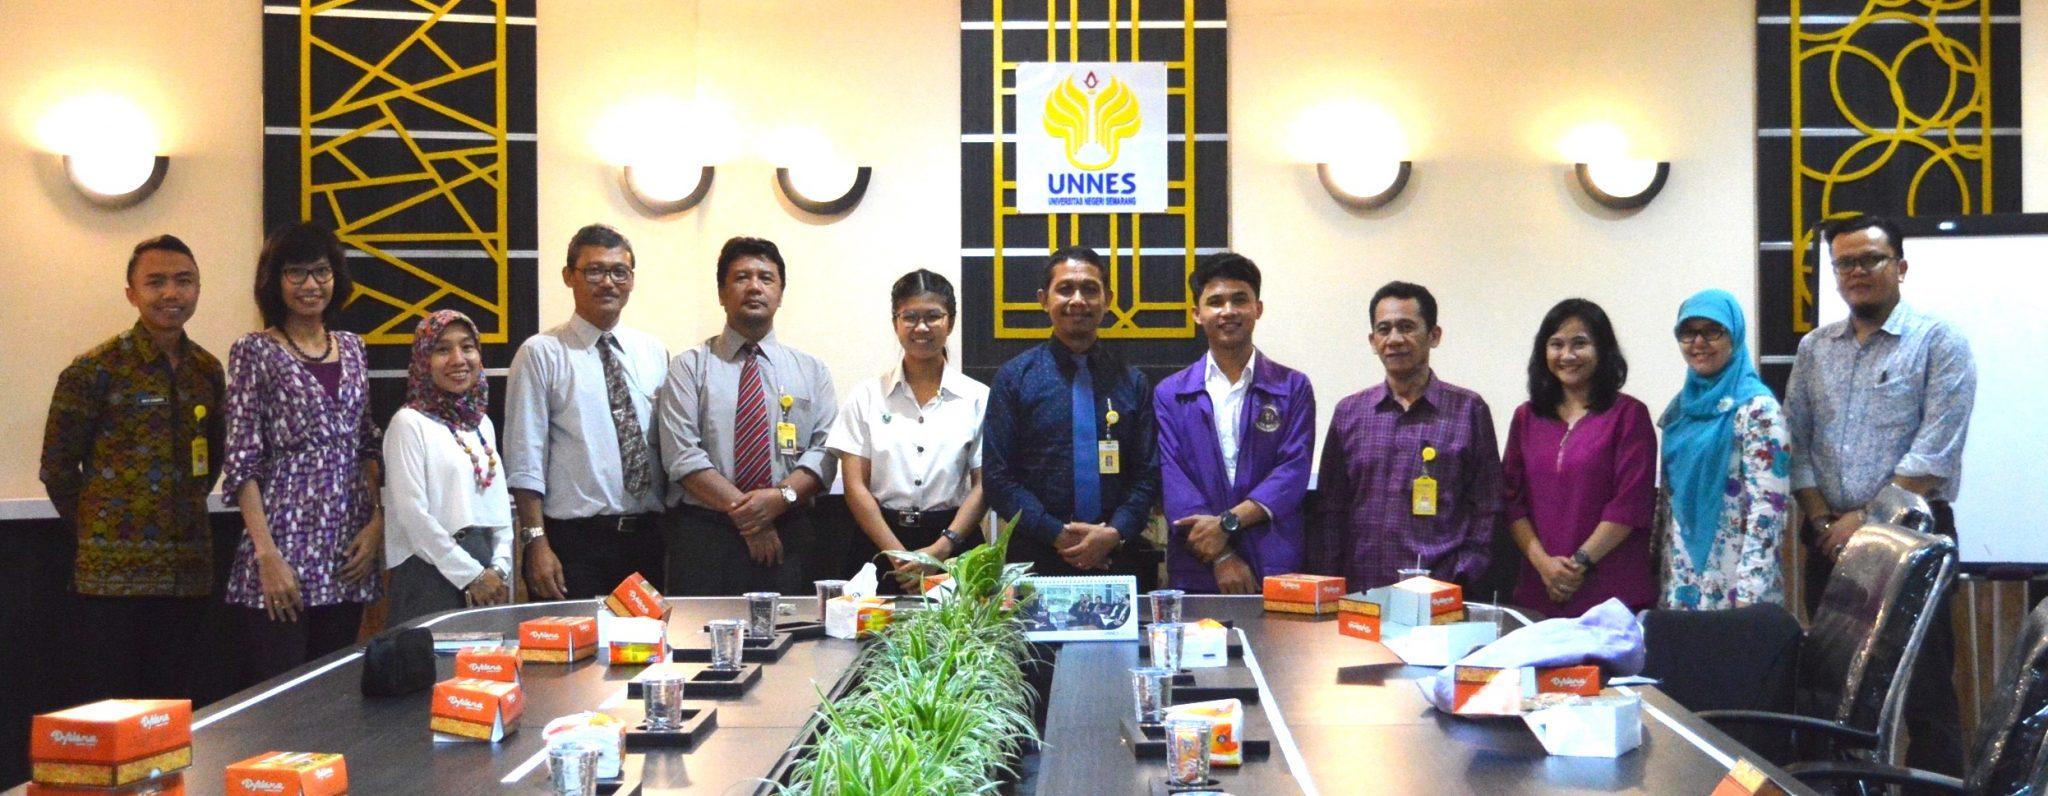 Tingkatkan Upaya Internasionalisasi, UNNES Terima Mahasiswa Kredit Transfer dari Kasertsart University, Thailand